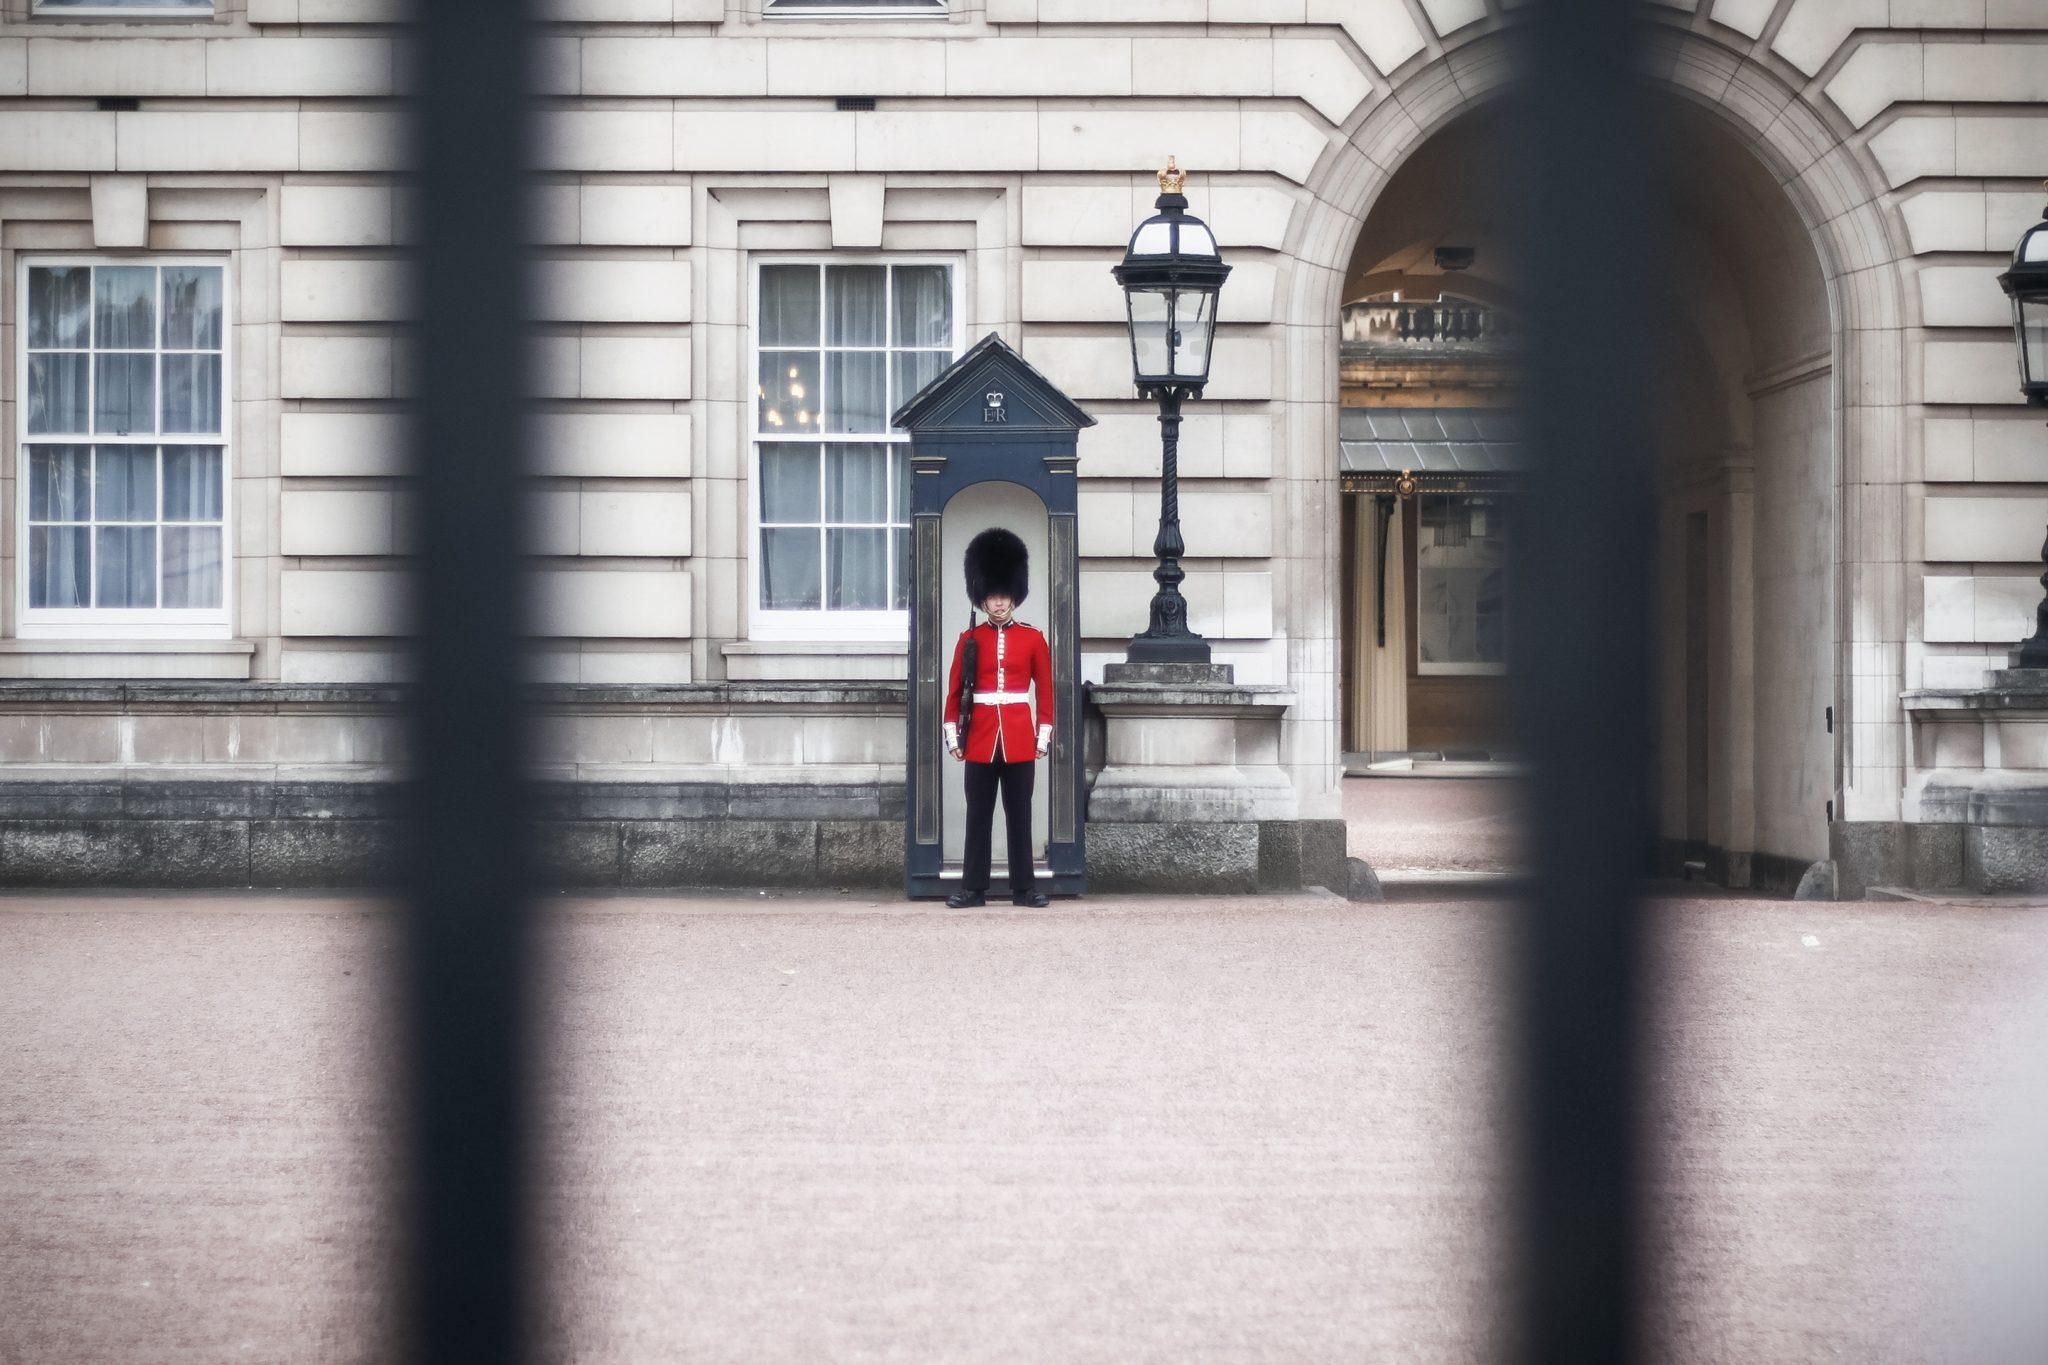 Buckingham Palace London | WORLD OF WANDERLUST